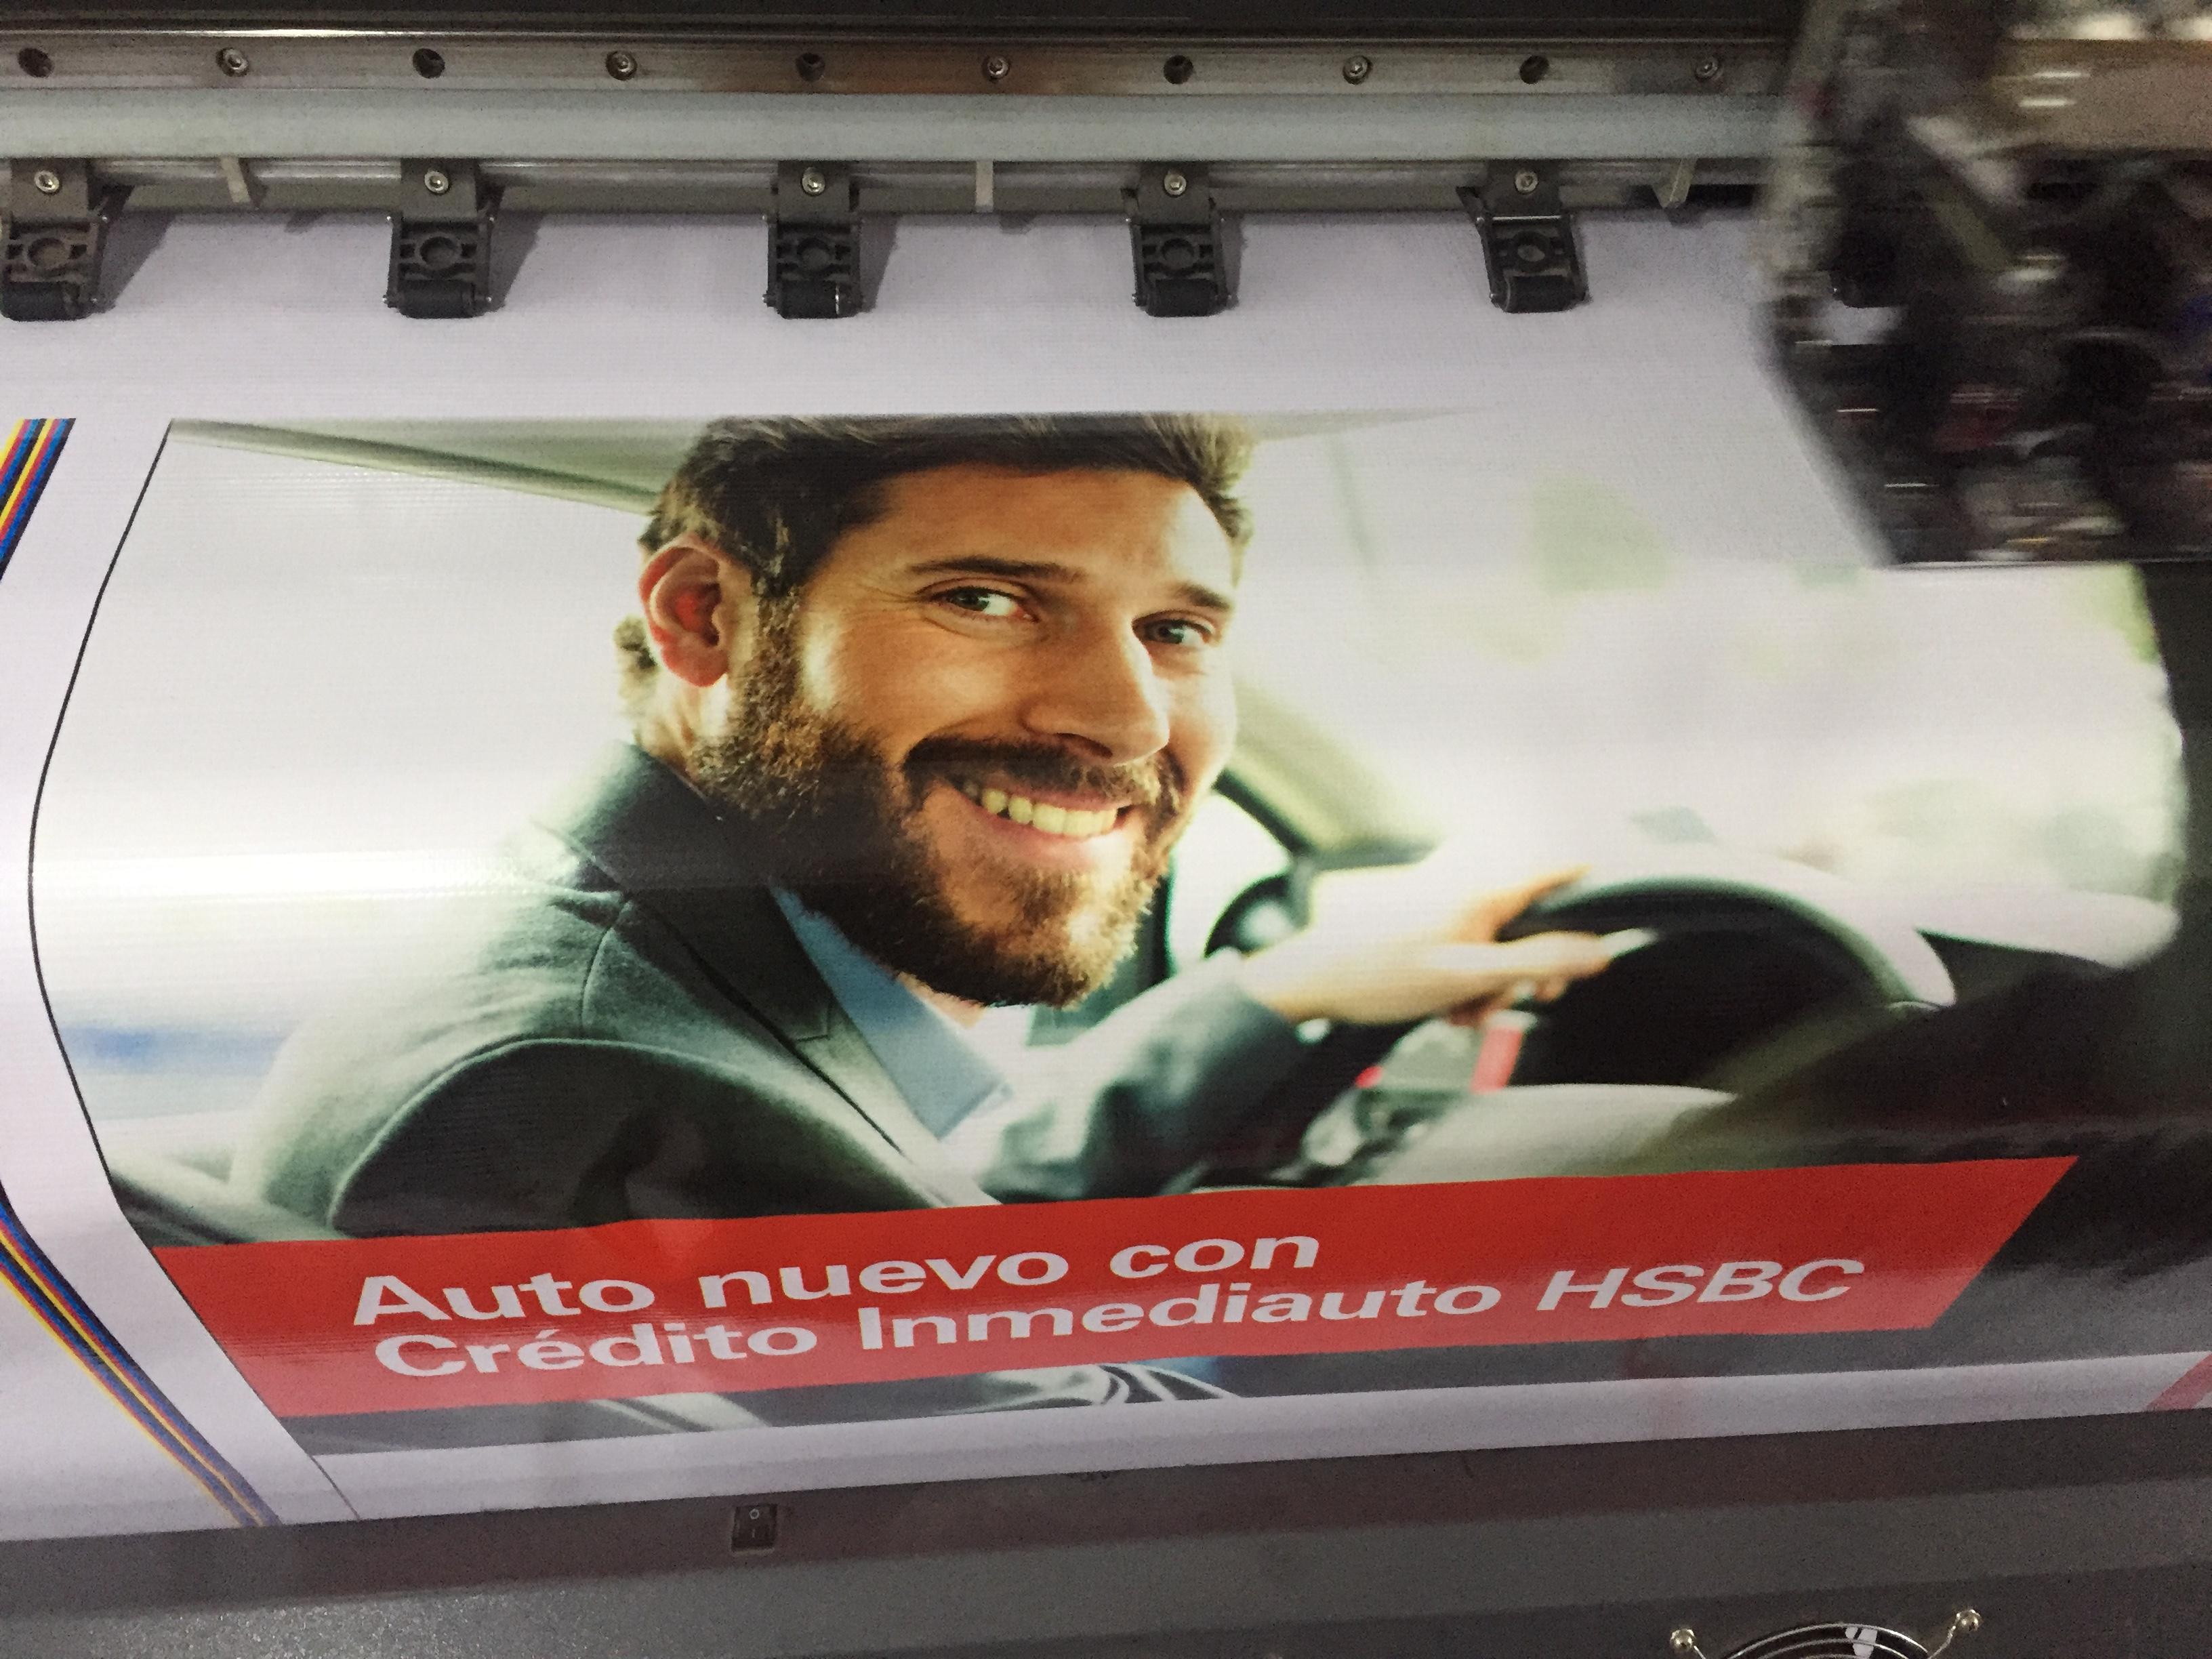 LONA HSBC INMEDIAUTO